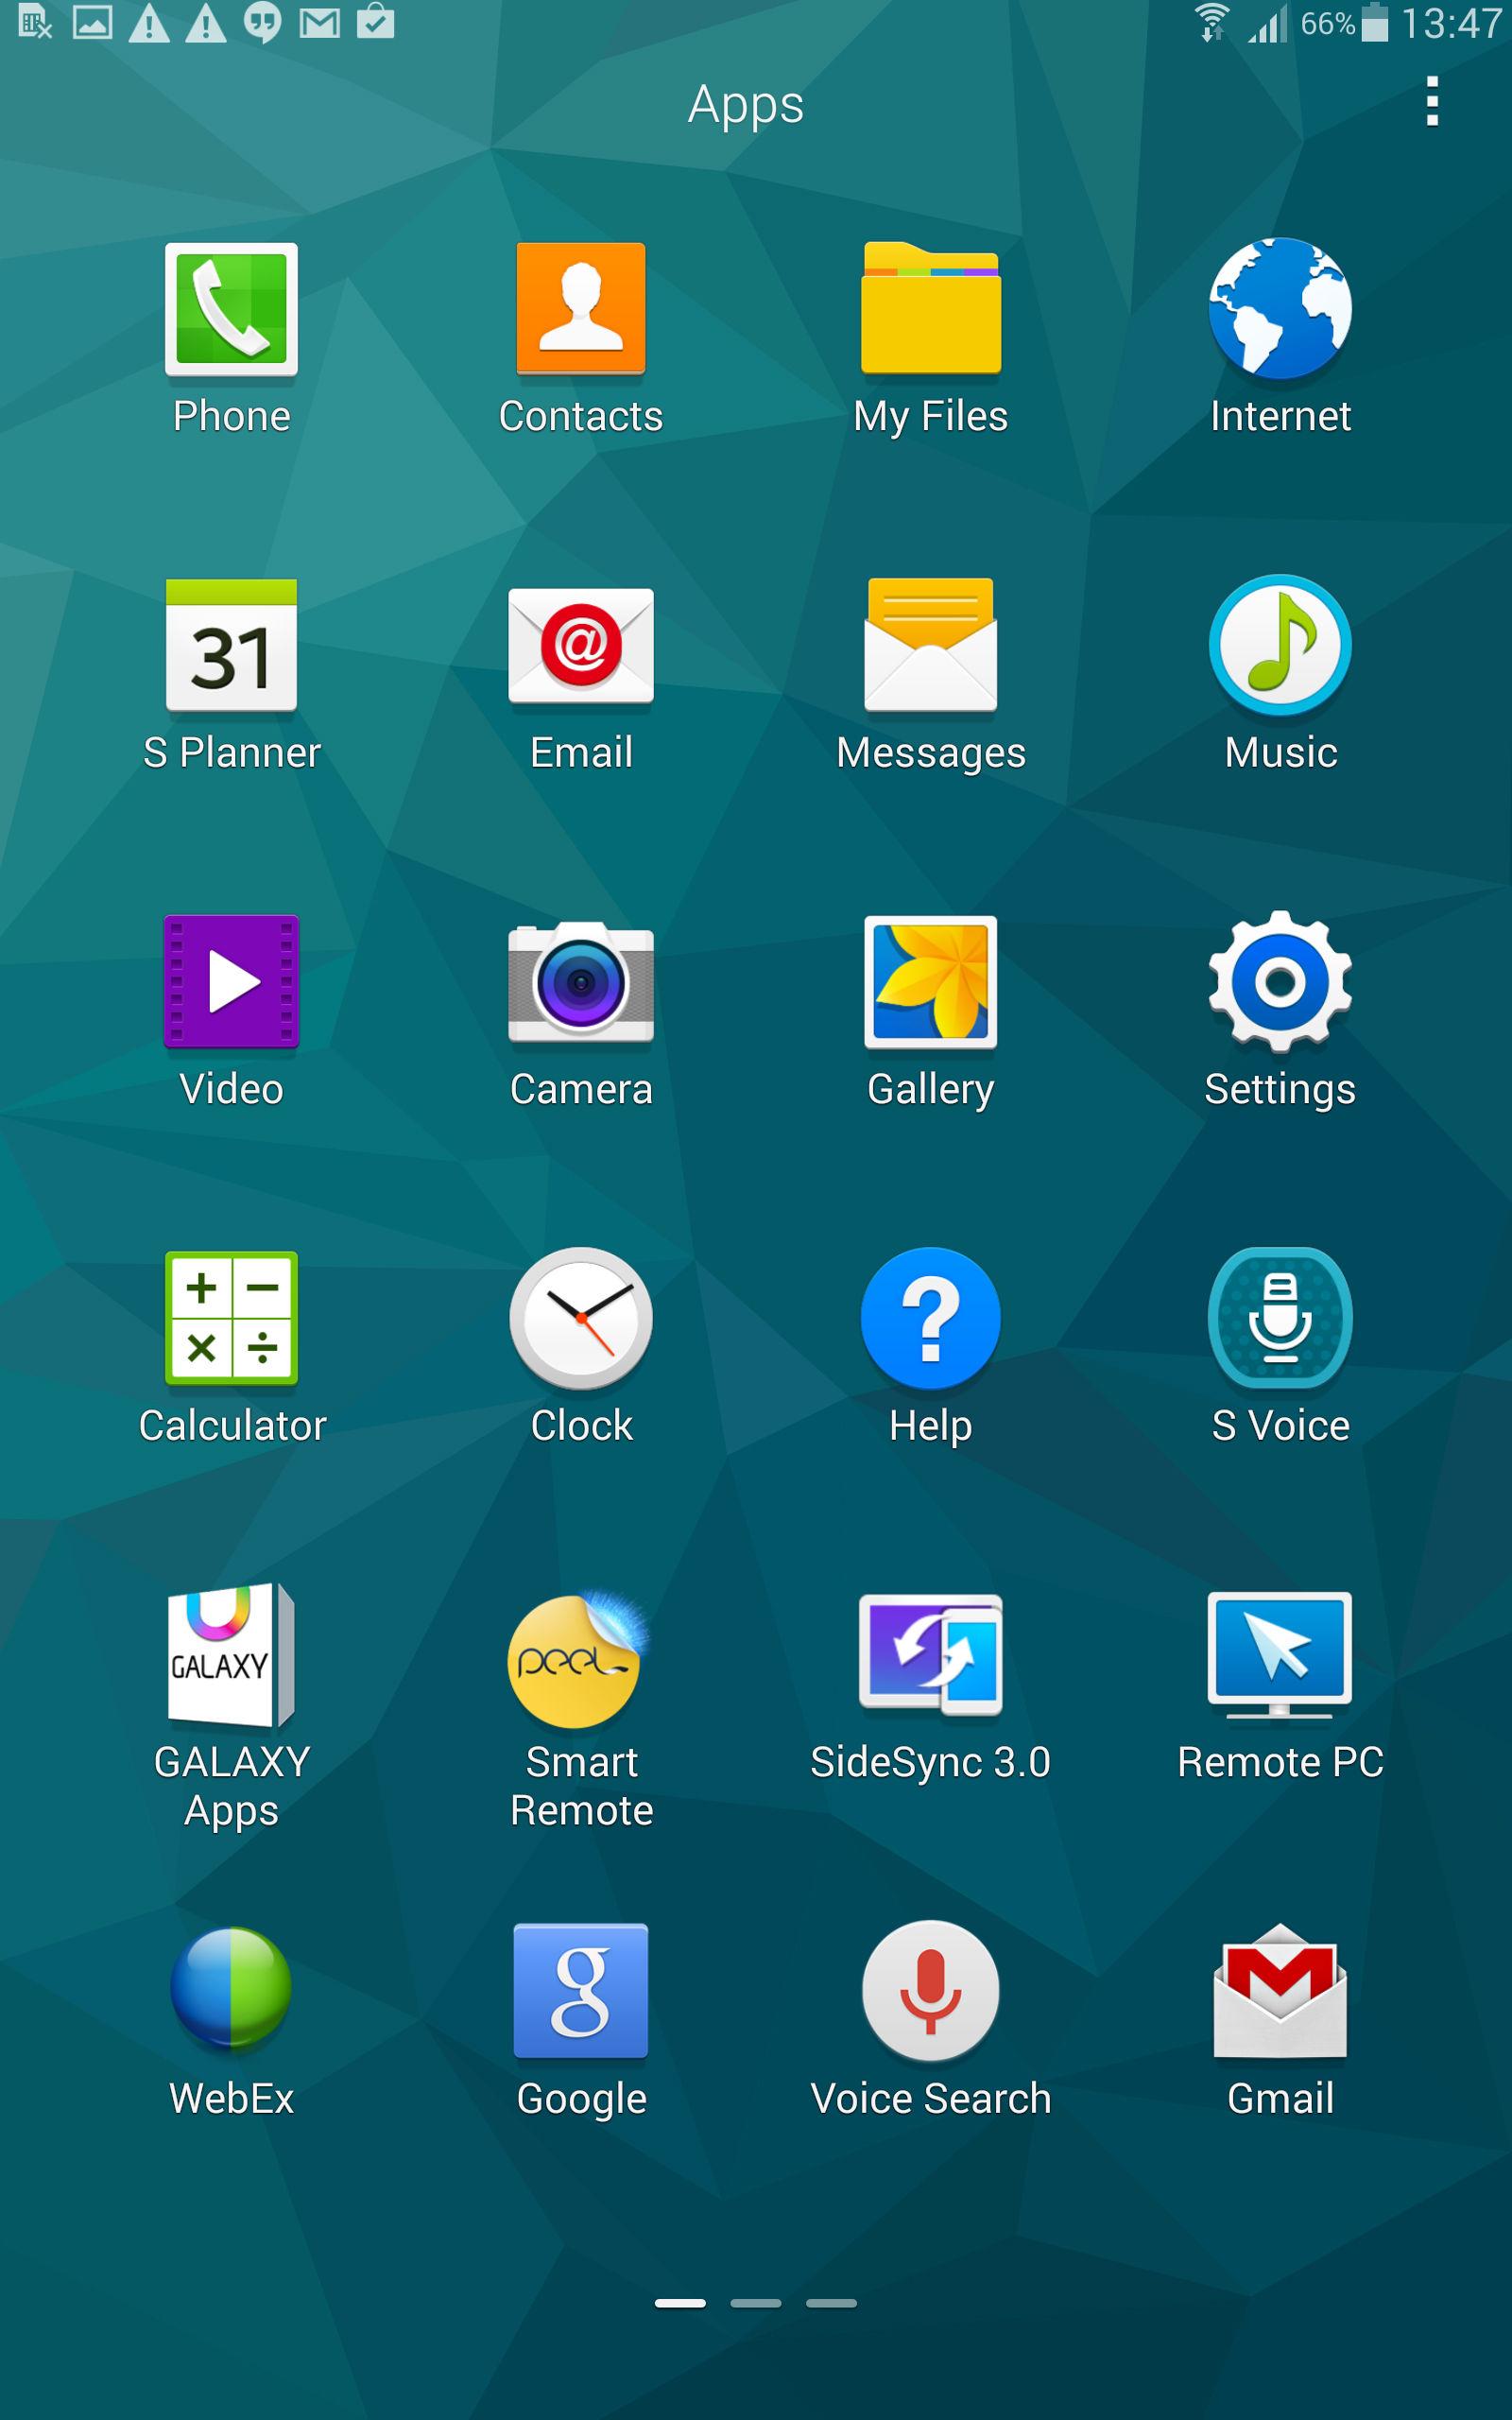 Samsungs App